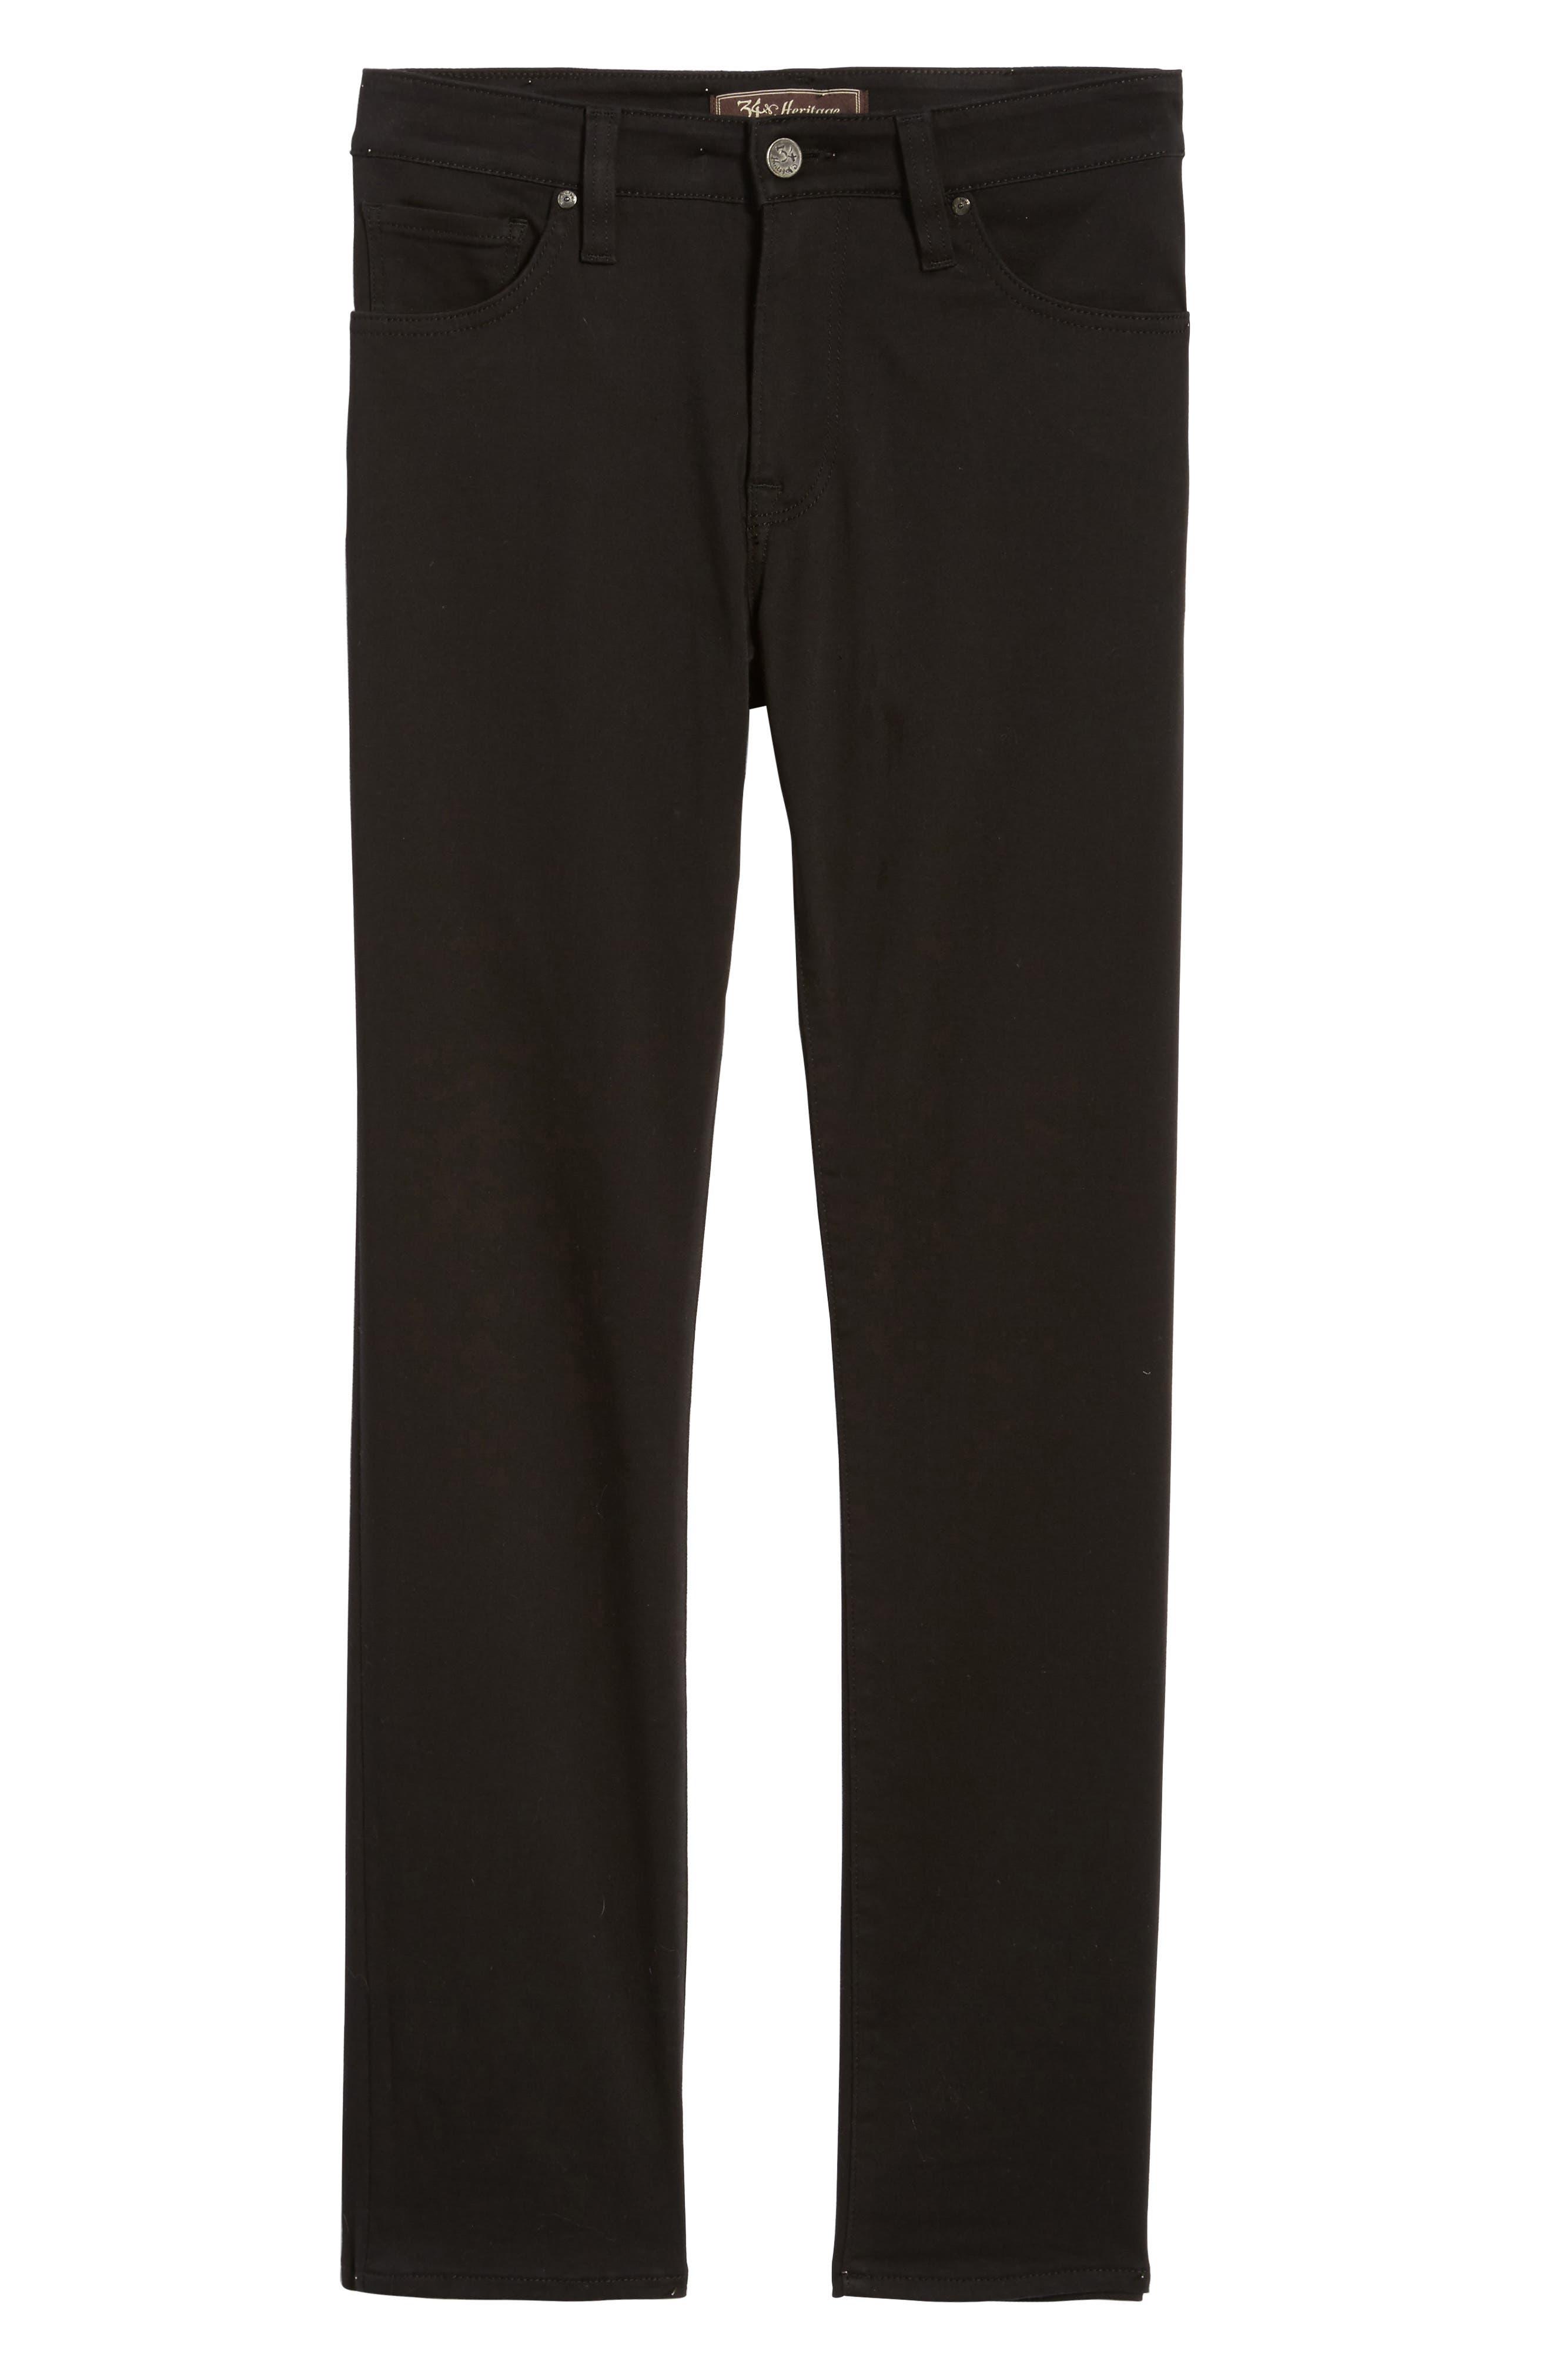 Courage Straight Leg Jeans,                             Alternate thumbnail 6, color,                             SELECT DOUBLE BLACK